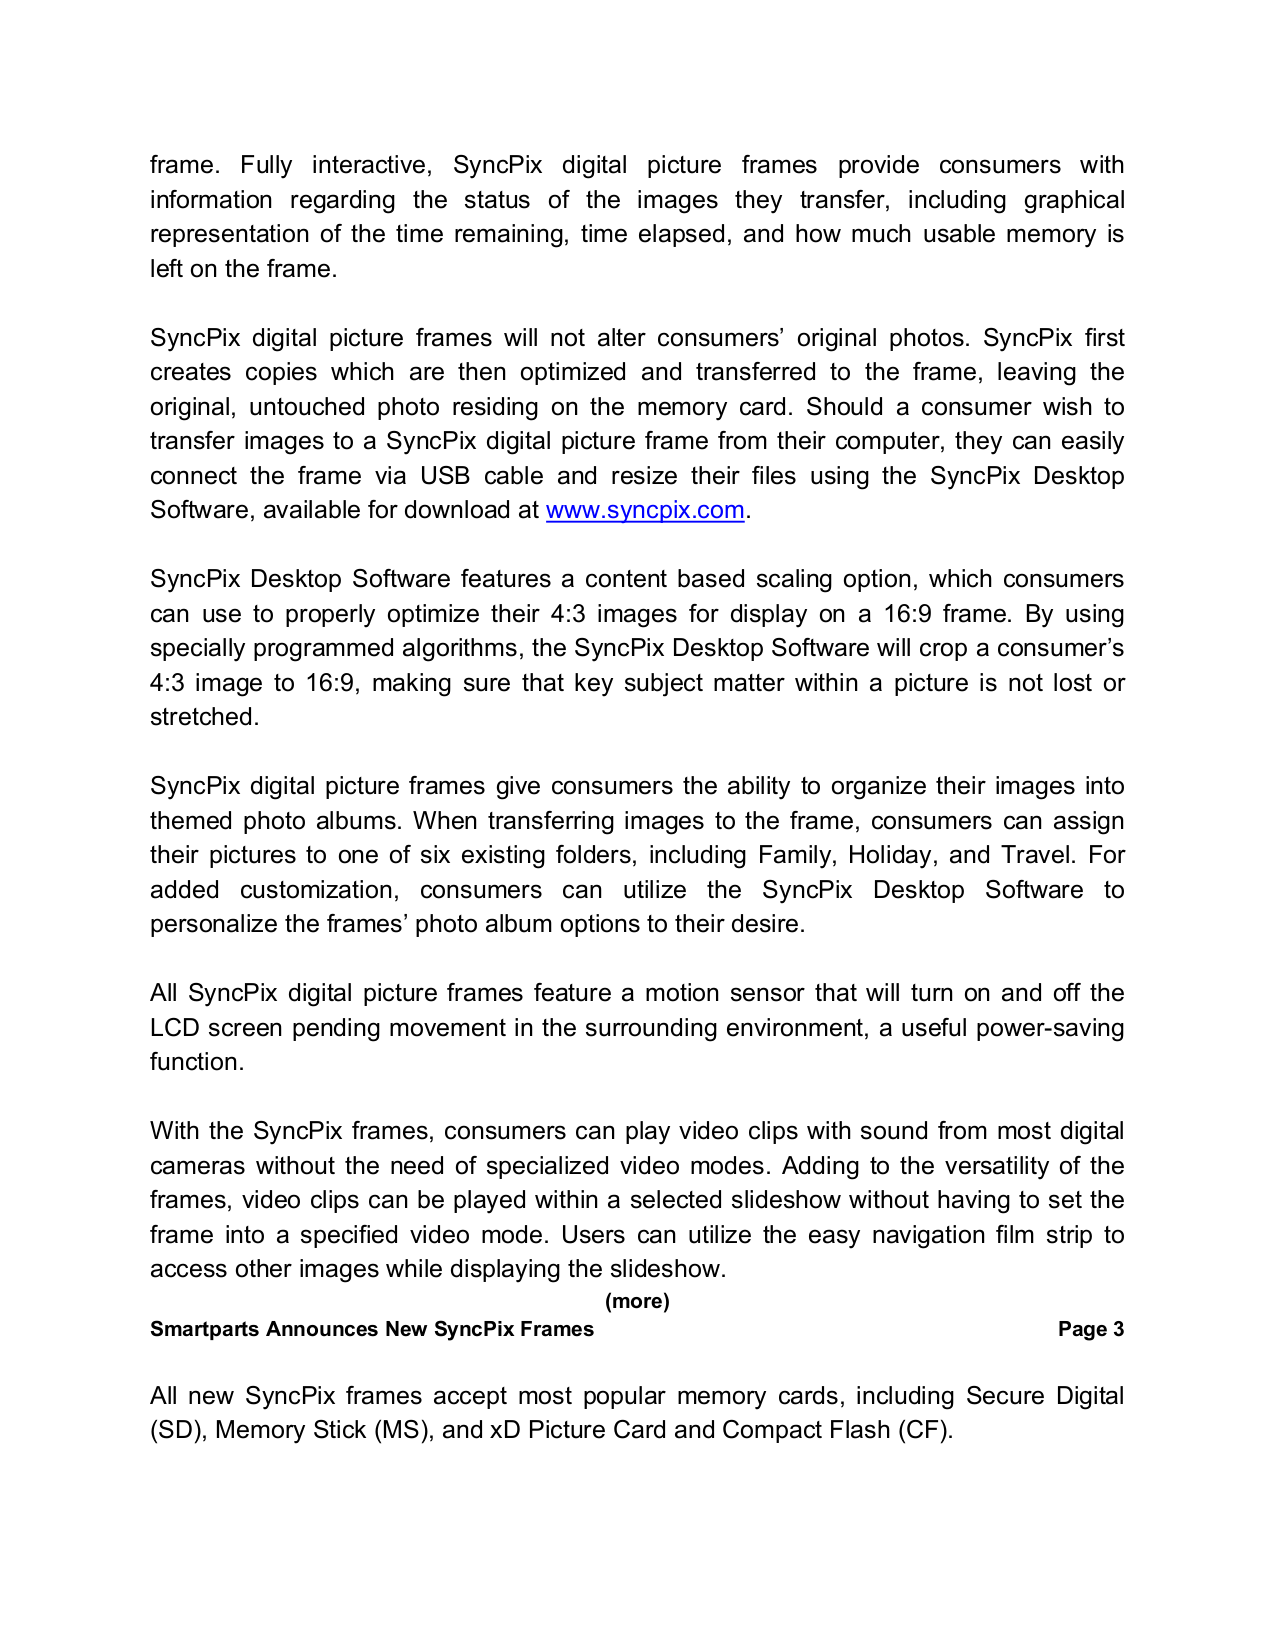 PDF manual for Smartparts Digital Photo Frame Syncpix SPX12